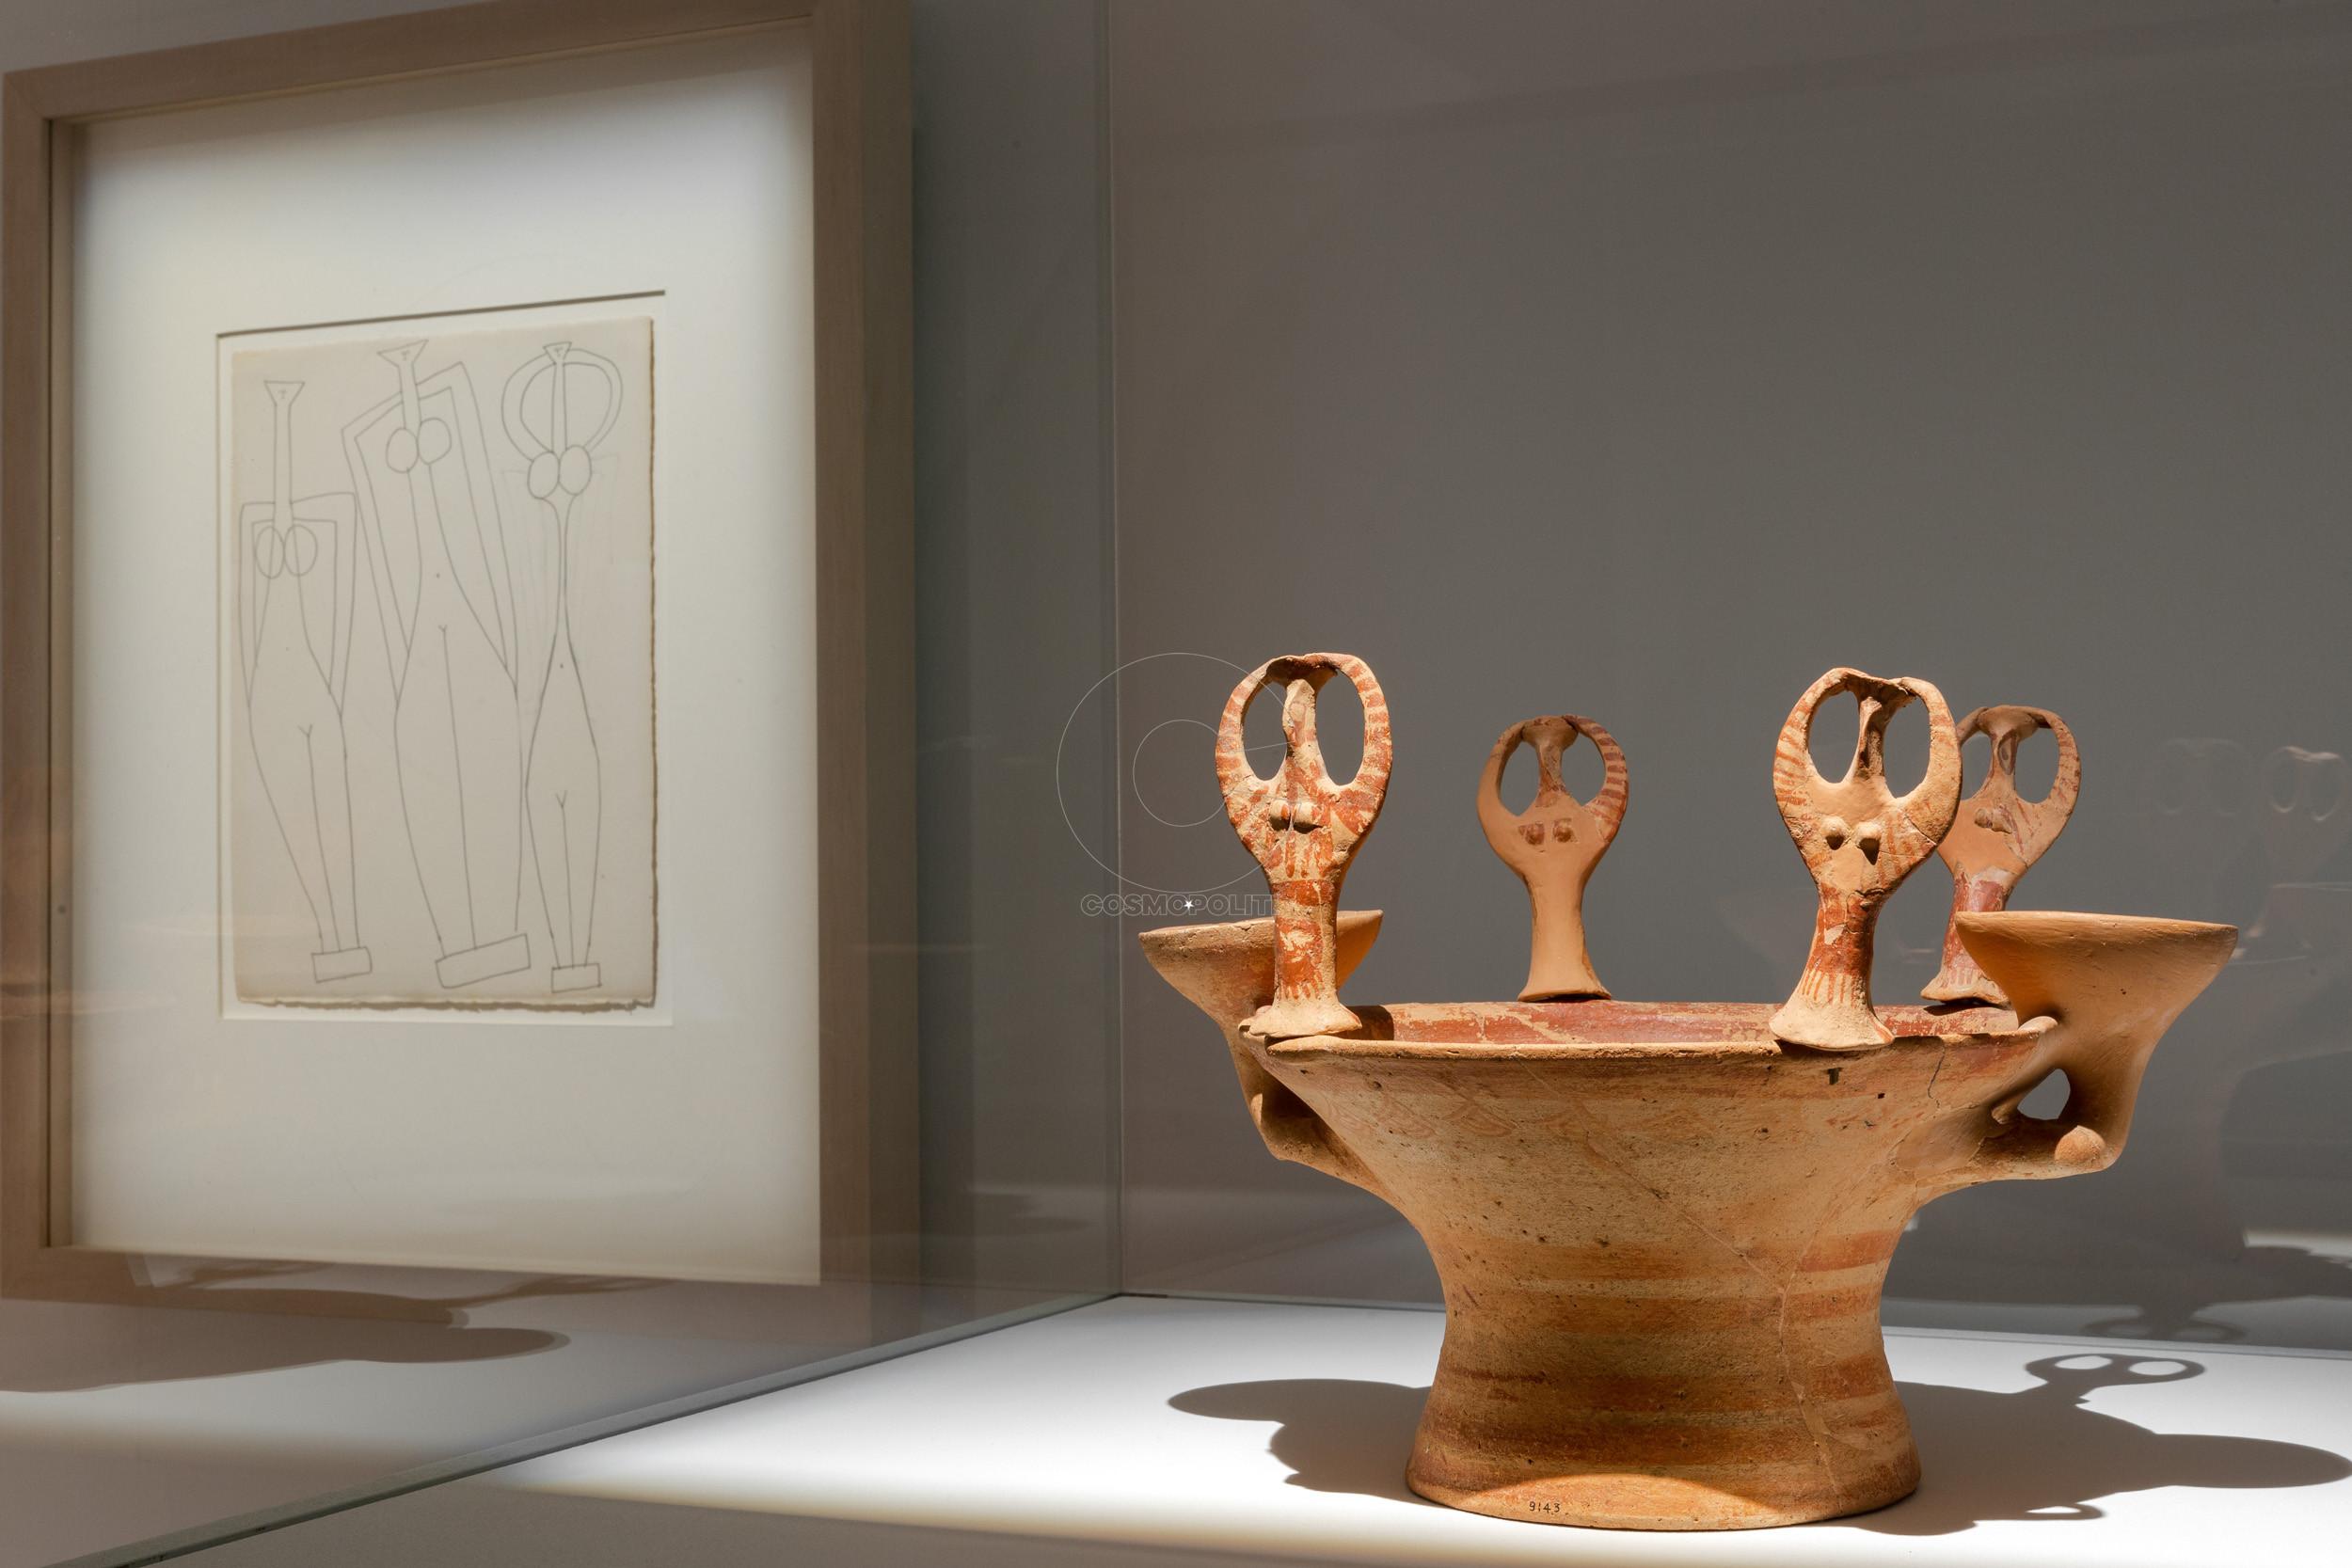 11_MUSEUM OF CYCLADIC ART© PHOTO PARIS TAVITIAN